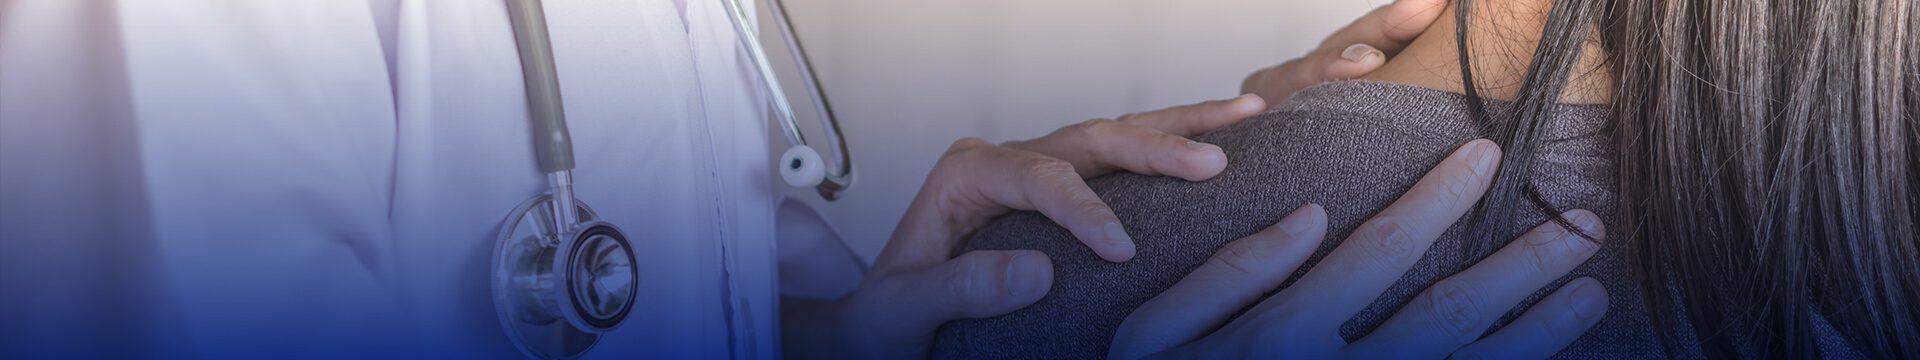 Healthcare provider's hands on patient's shoulder.